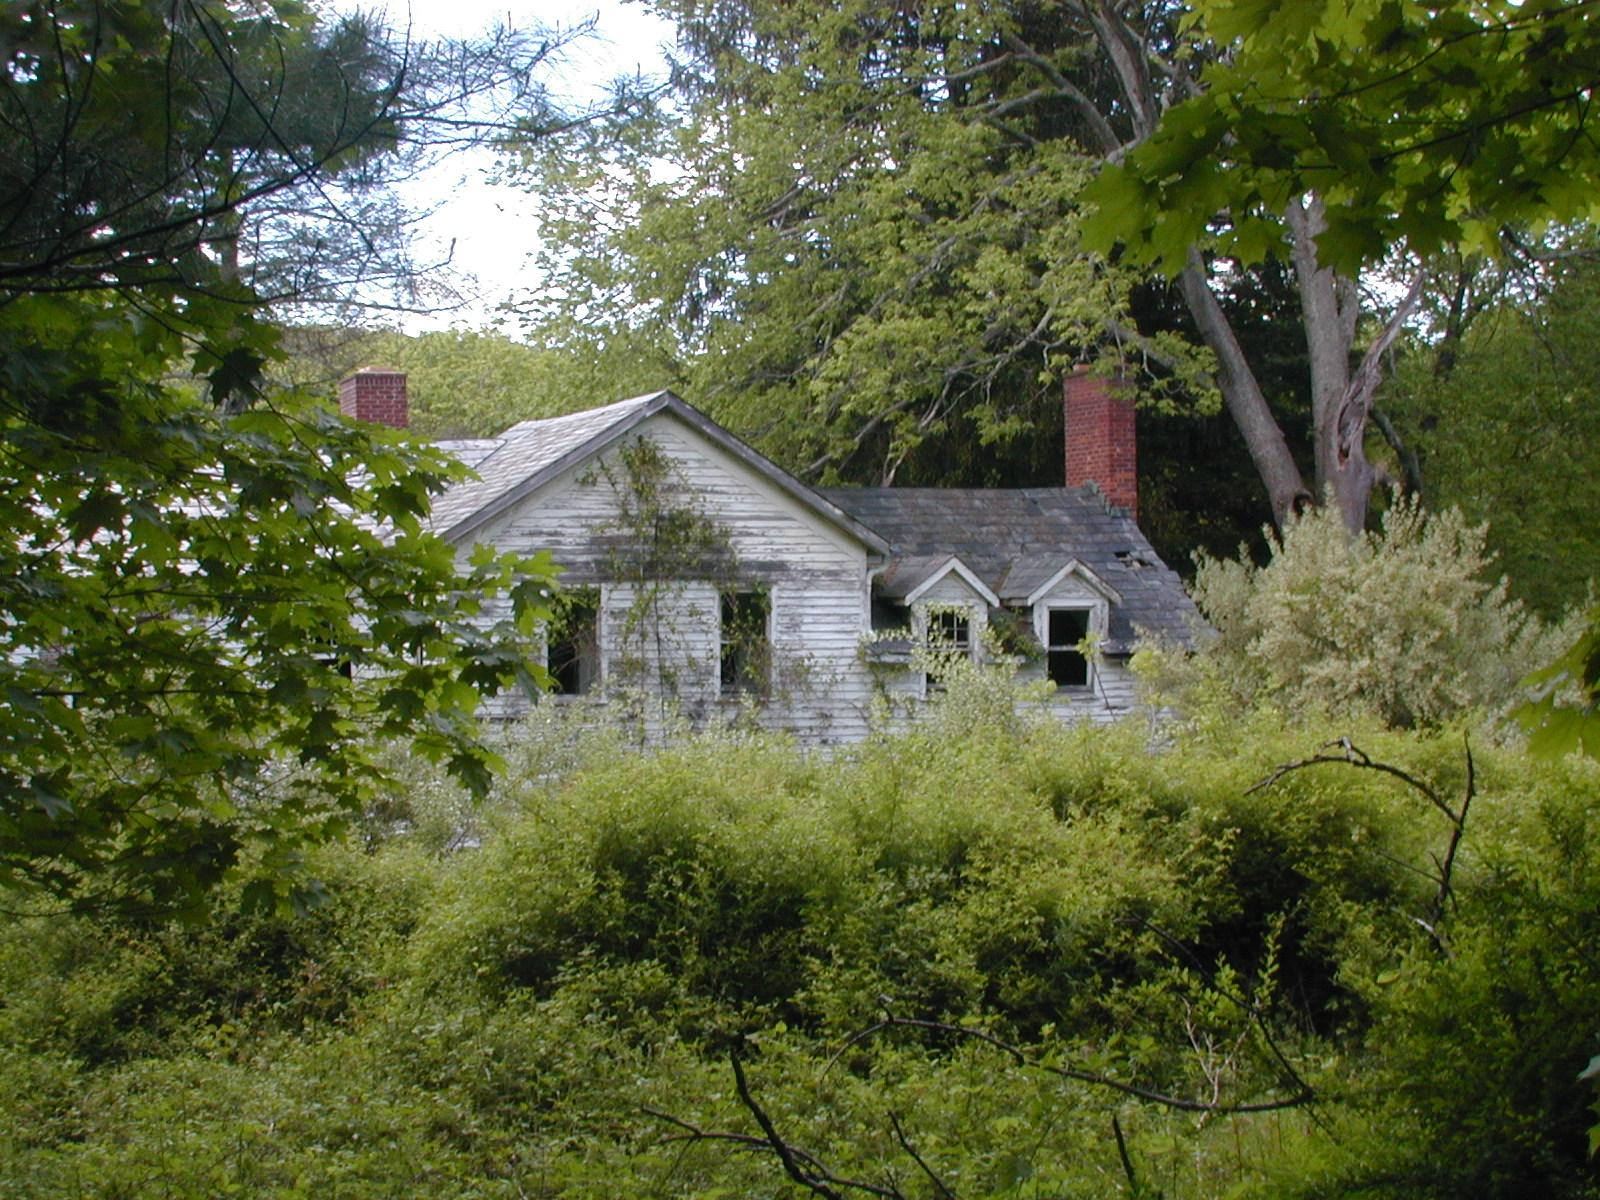 The Depue farmhouse